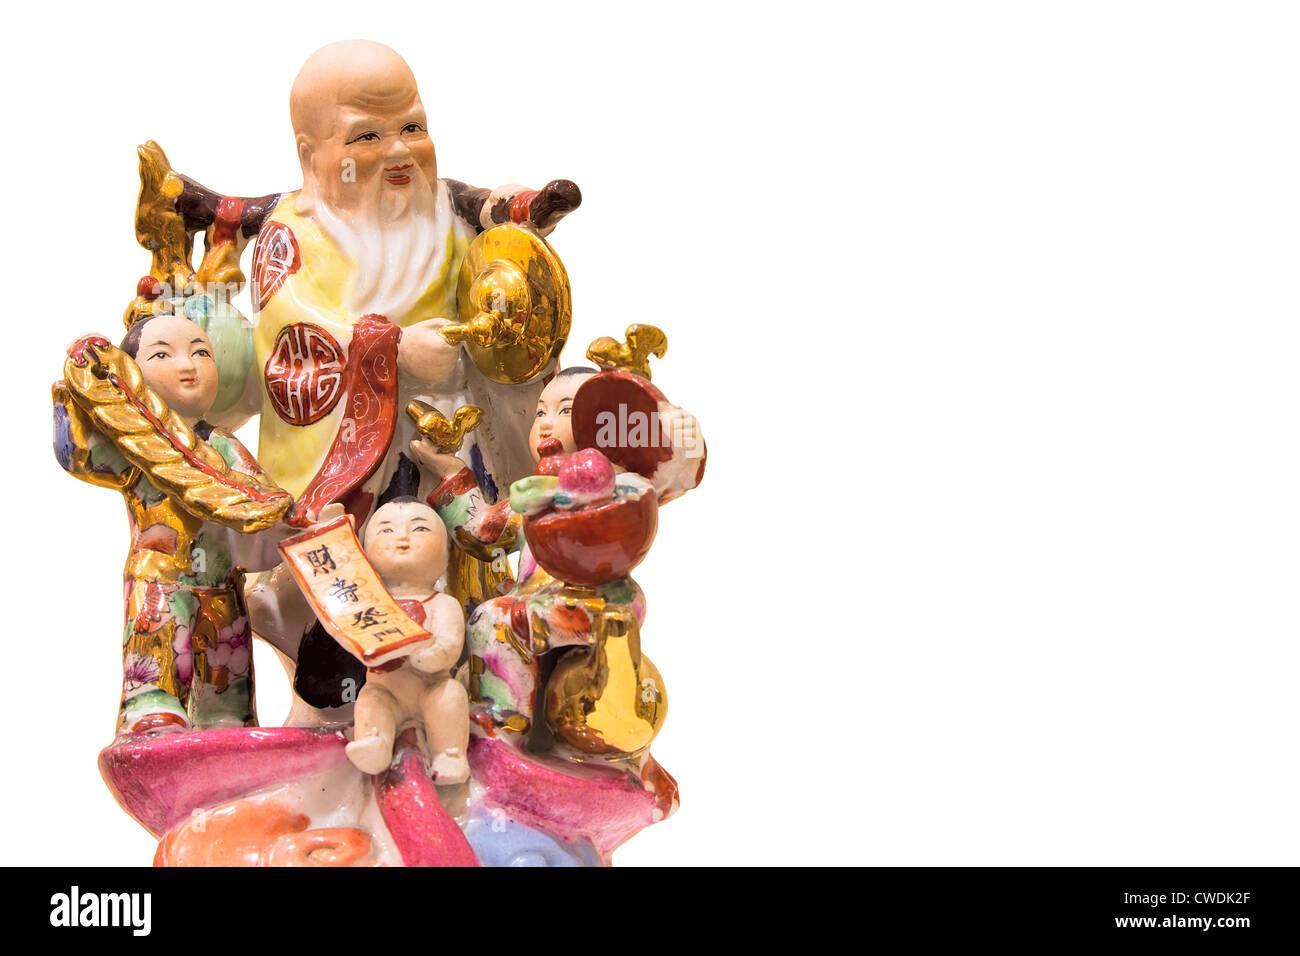 Longevity God Antique Porcelain Figurine with Three Prosperity Children Isolated on White Background - Stock Image